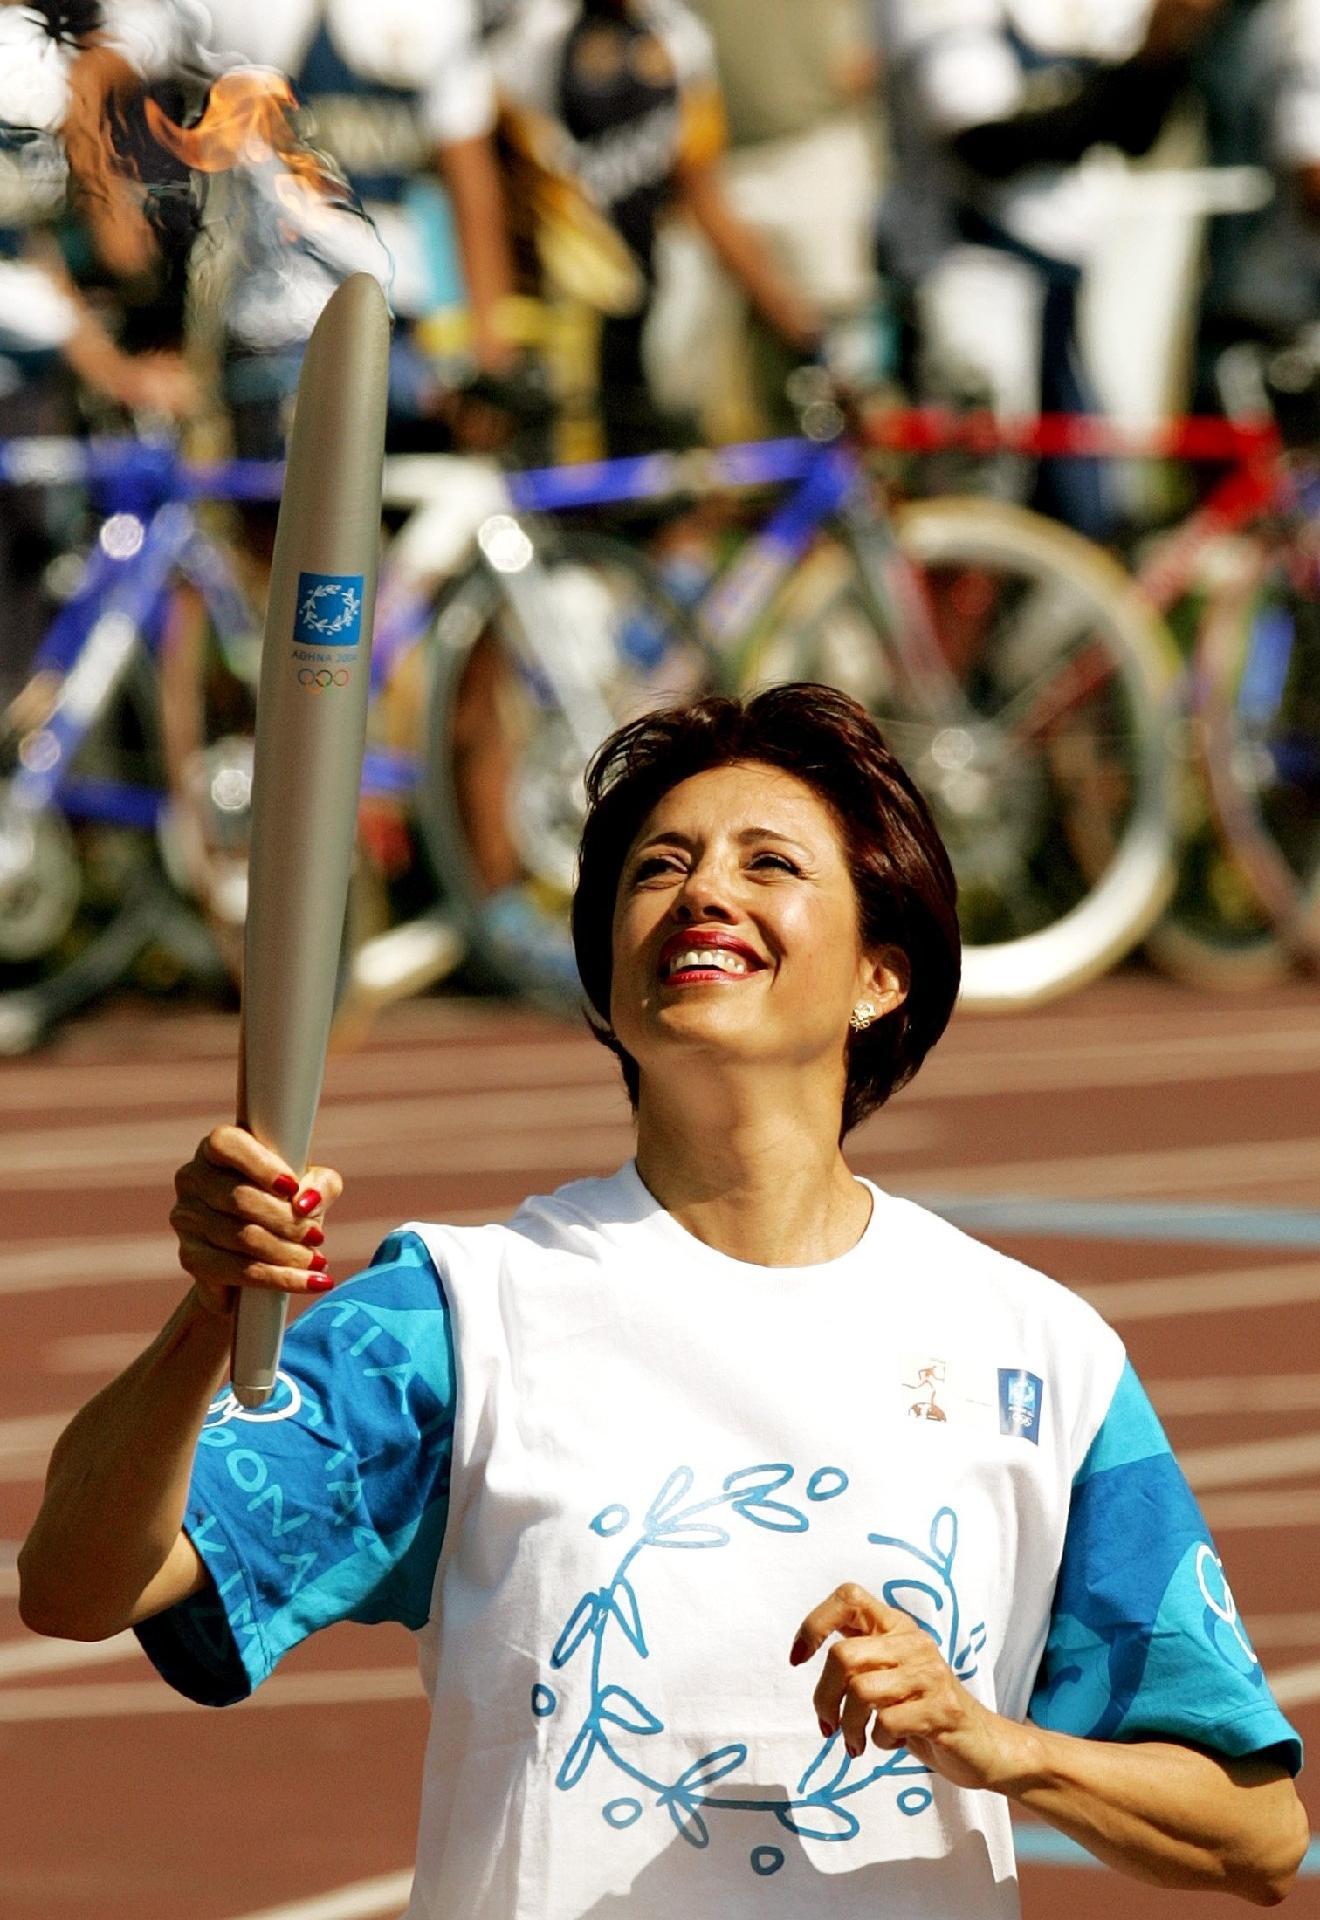 Enriqueta Basilio, primeira mulher a acender a pira olímpica, morre aos 71 anos